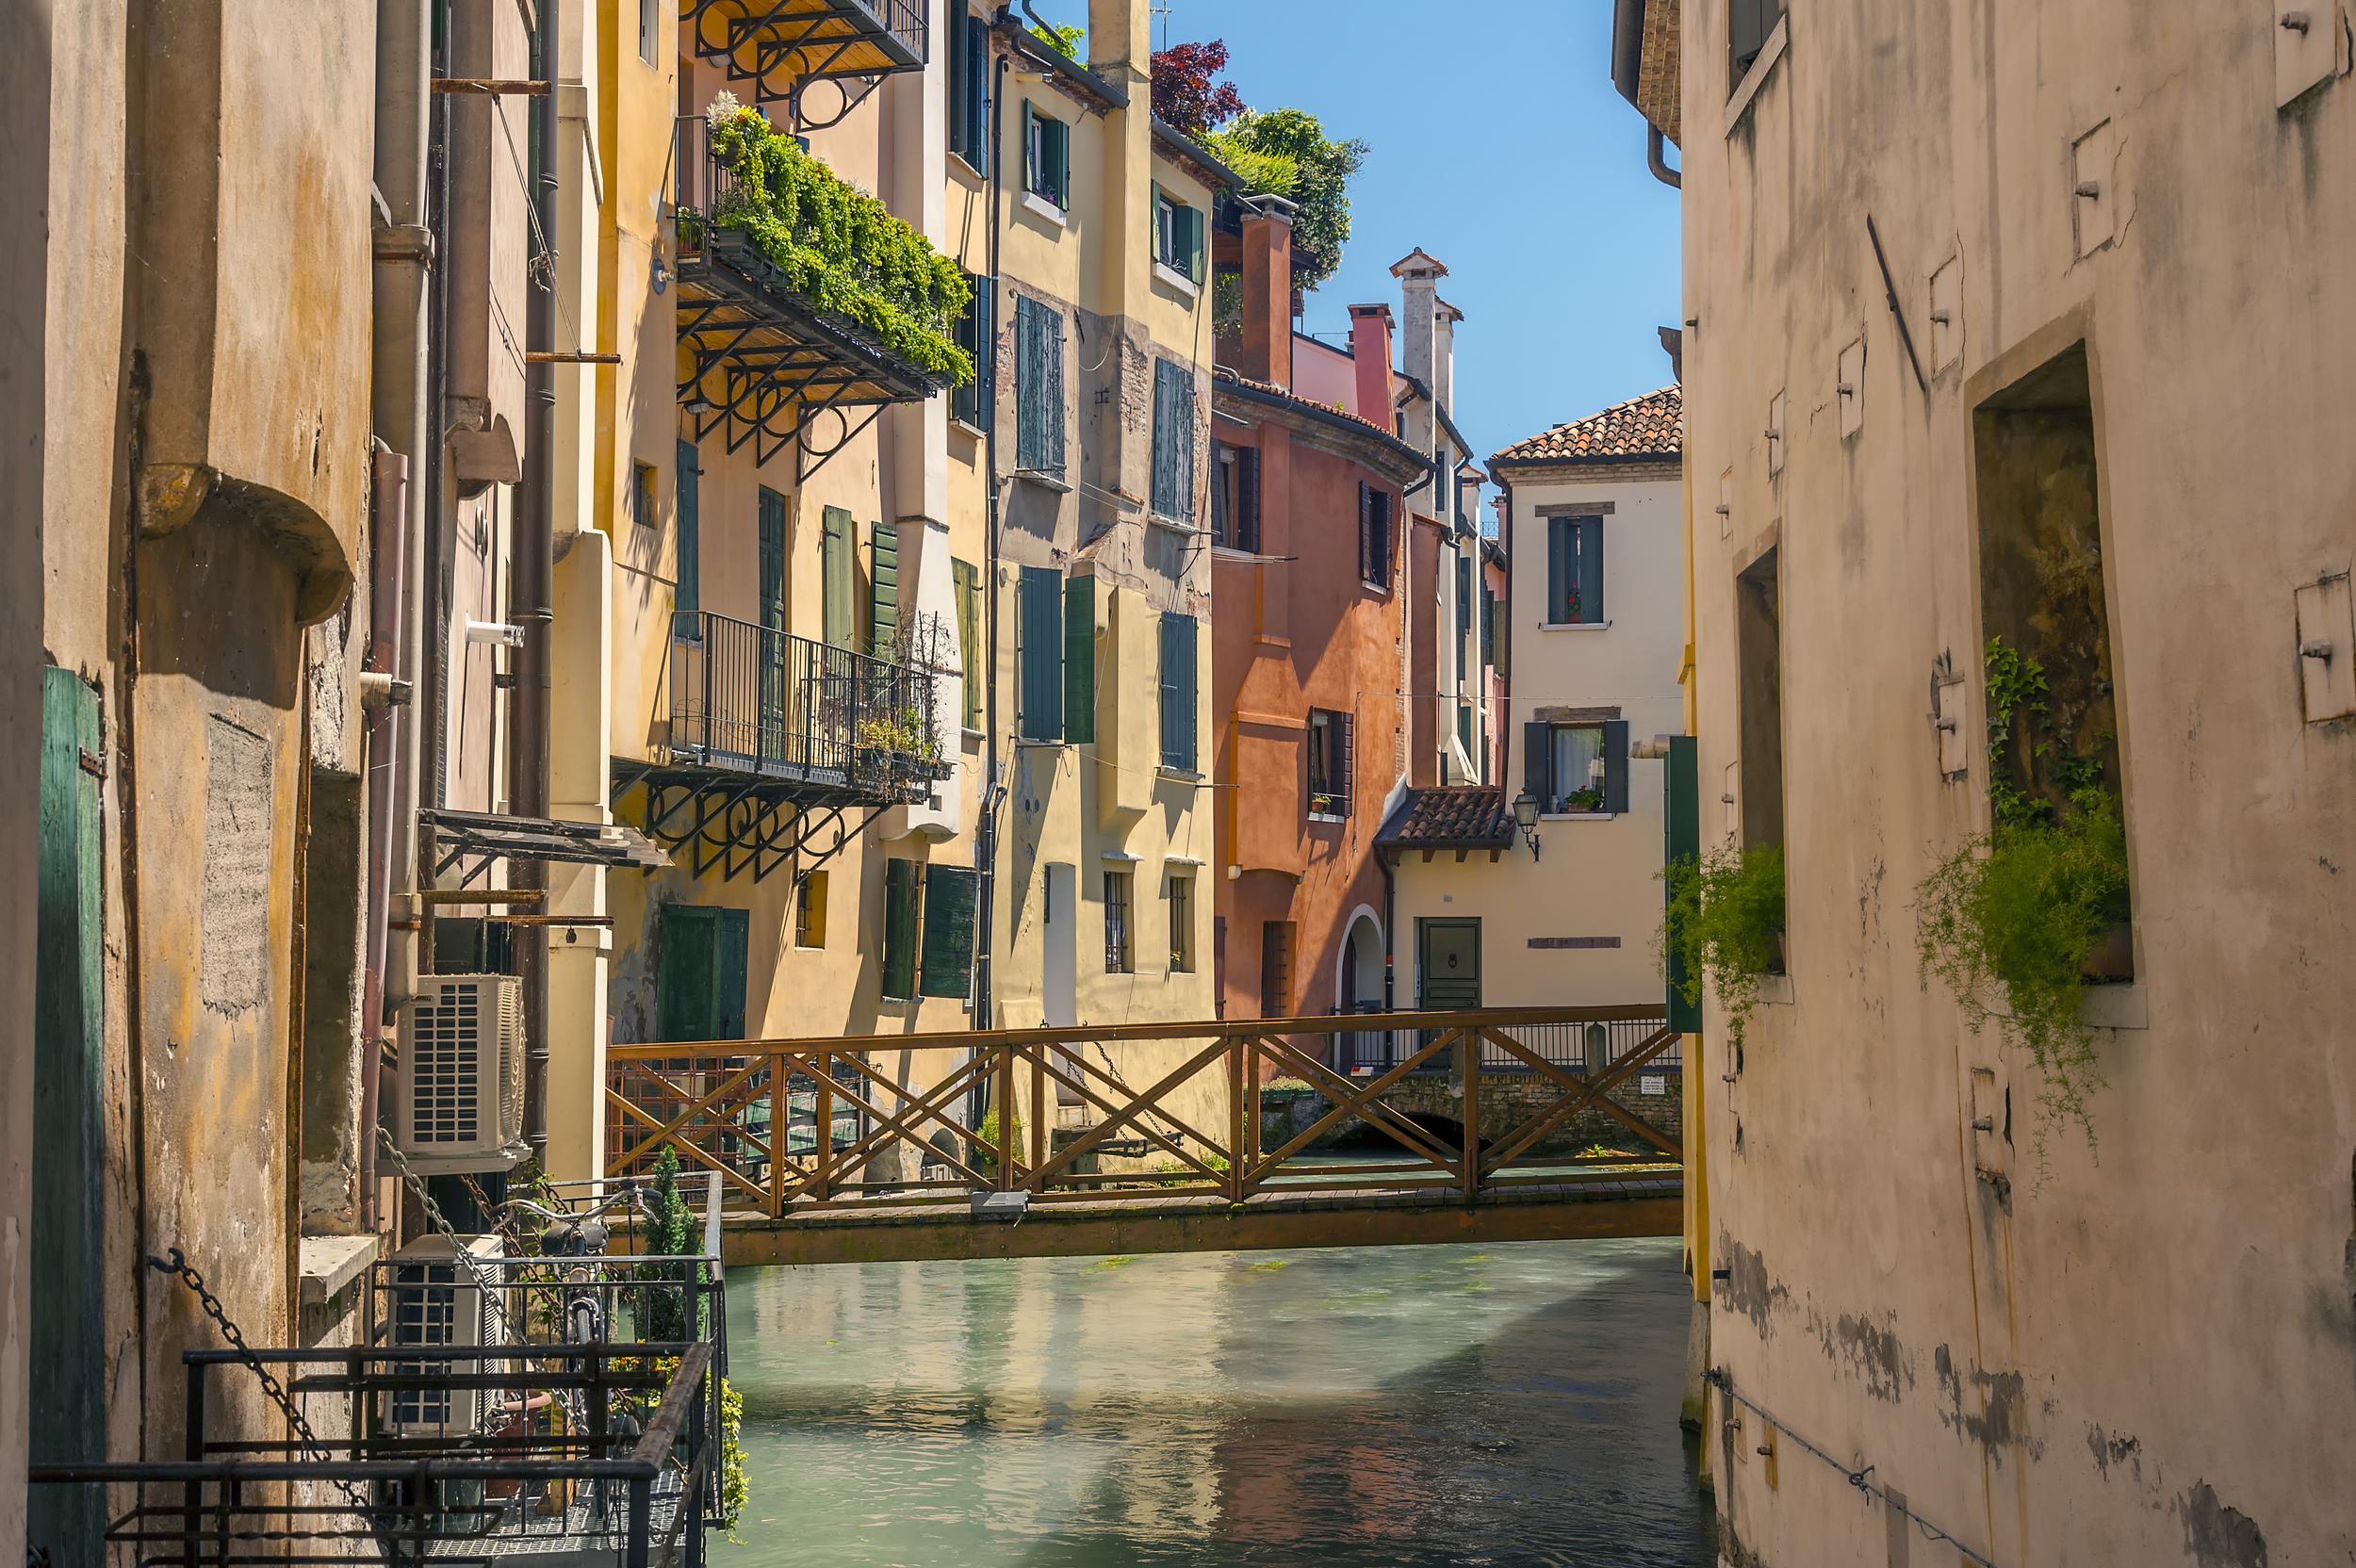 Walking around Treviso